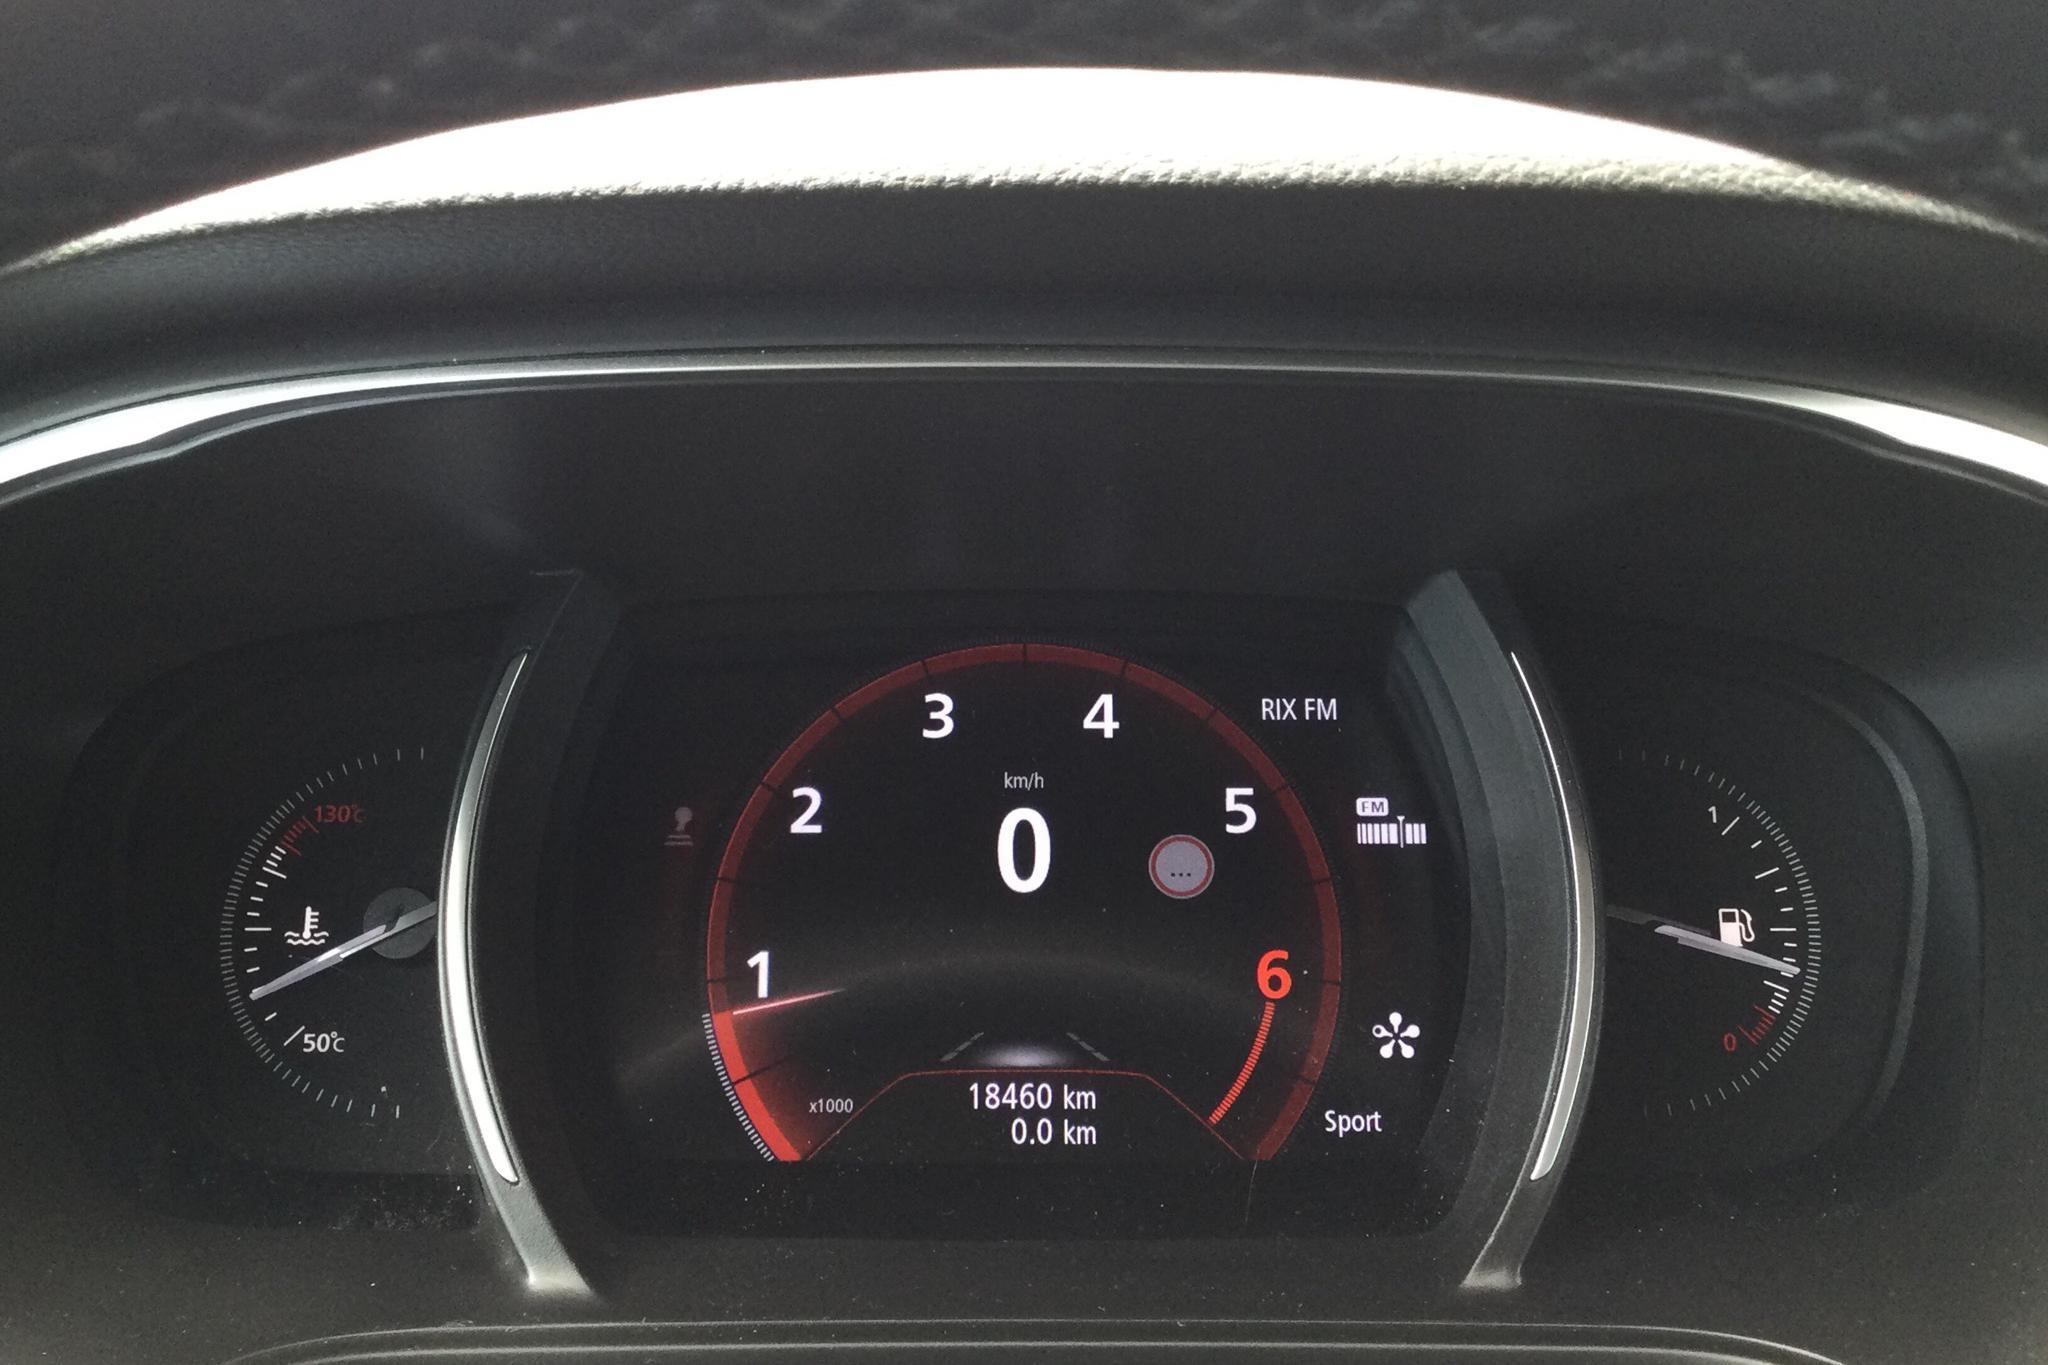 Renault Mégane 1.2 TCe 5dr (130hk) - 18 470 km - Manual - gray - 2018